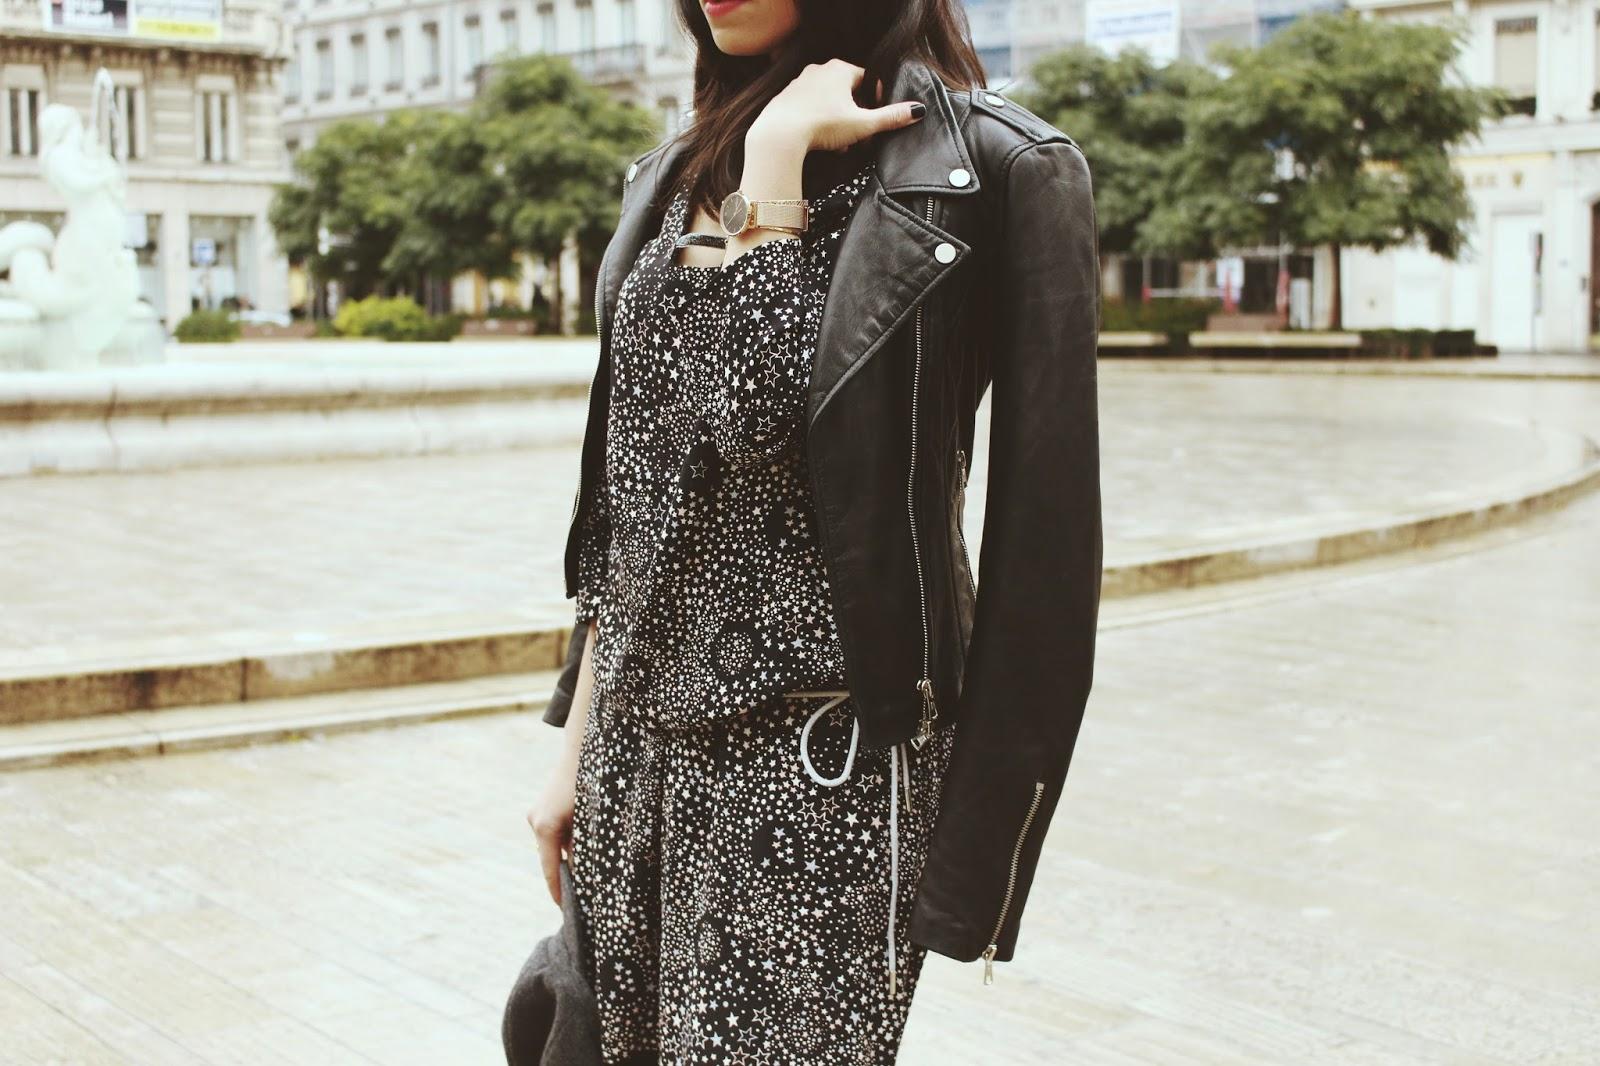 blog mode, blogueuse mode, blogueuse lyonnaise, blog mode lyon, blog  mode paris, modeuse, robe étoilée, robe étoiles, french blogger